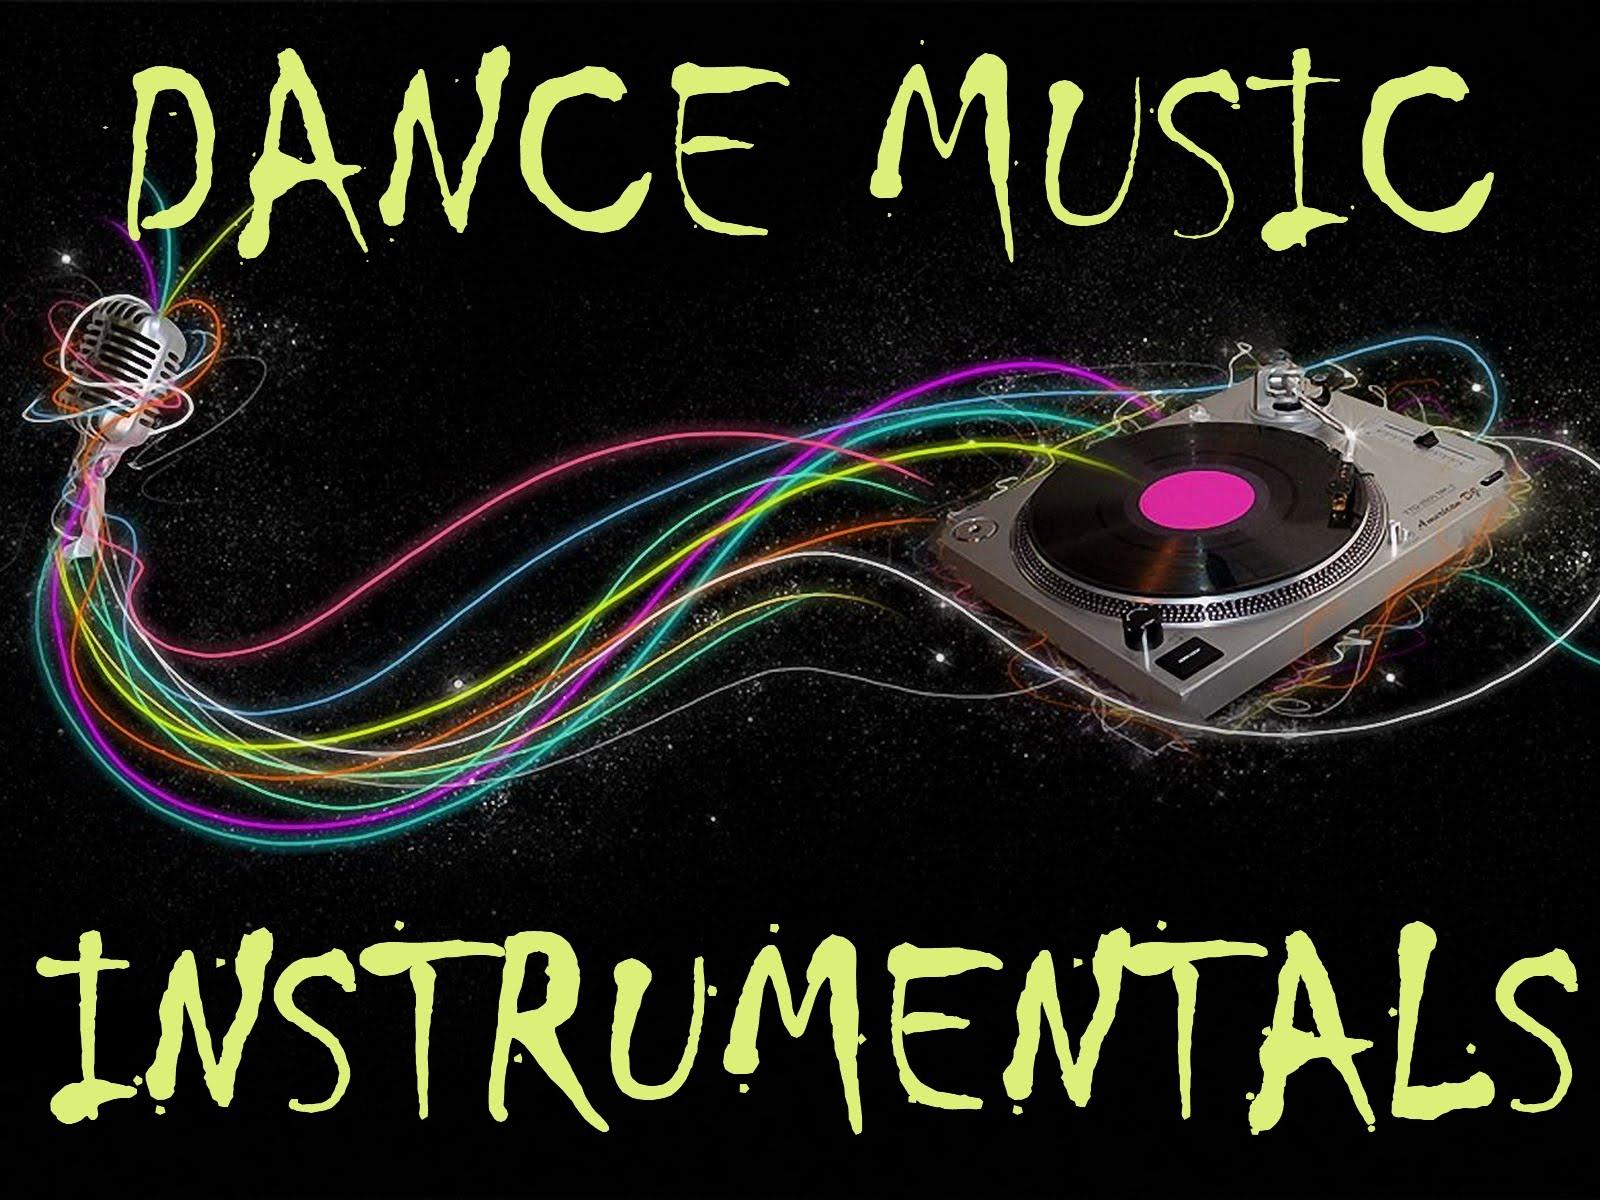 http://4.bp.blogspot.com/_T6BsOX4CfxA/S6uGq4fjBUI/AAAAAAAAAoo/Vg3z6L_fvLw/s1600/DANCE+MUSIC+INSTRUMENTALS.jpg